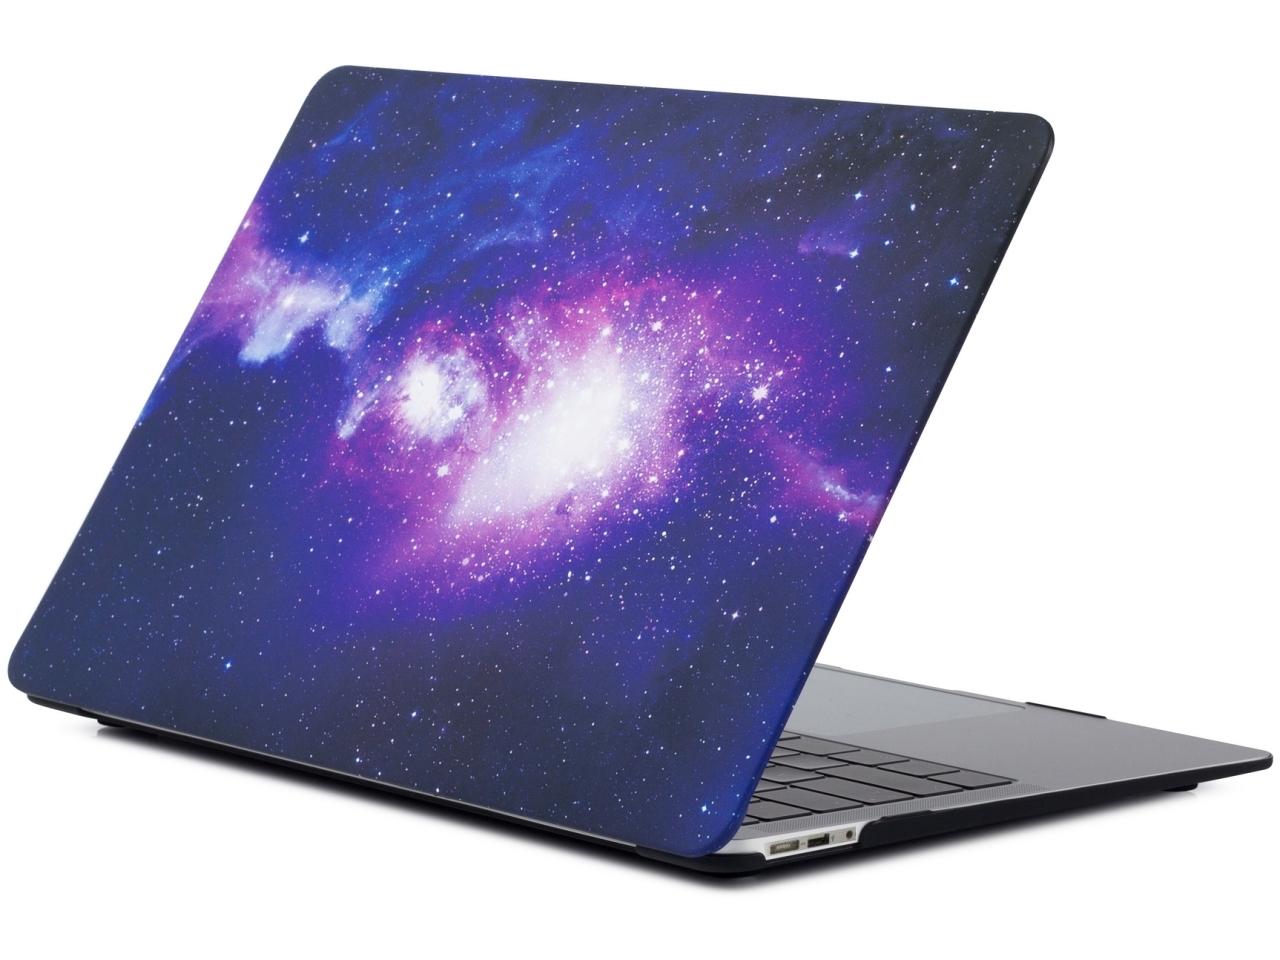 apple macbook pro air macbook air 13 esons. Black Bedroom Furniture Sets. Home Design Ideas